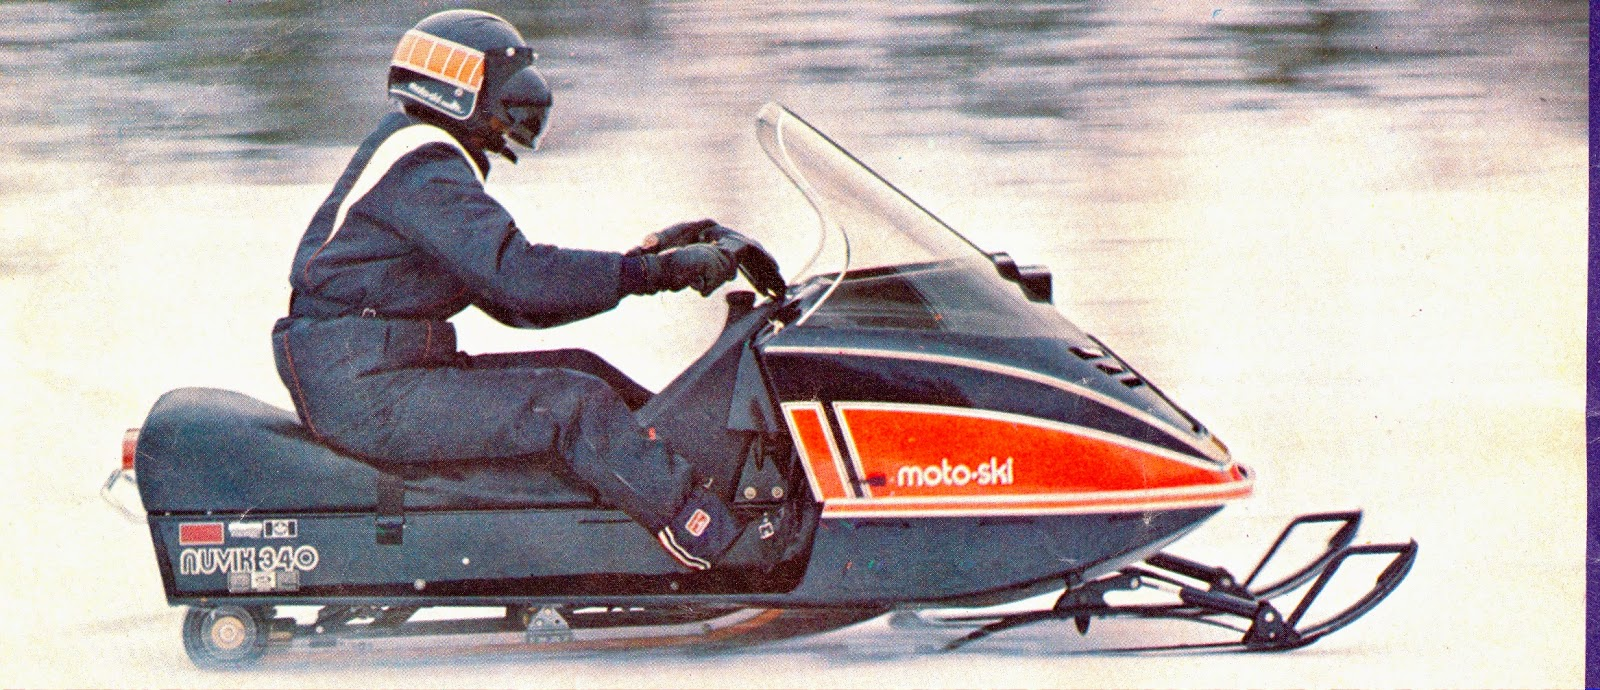 1976 Moto Ski Page